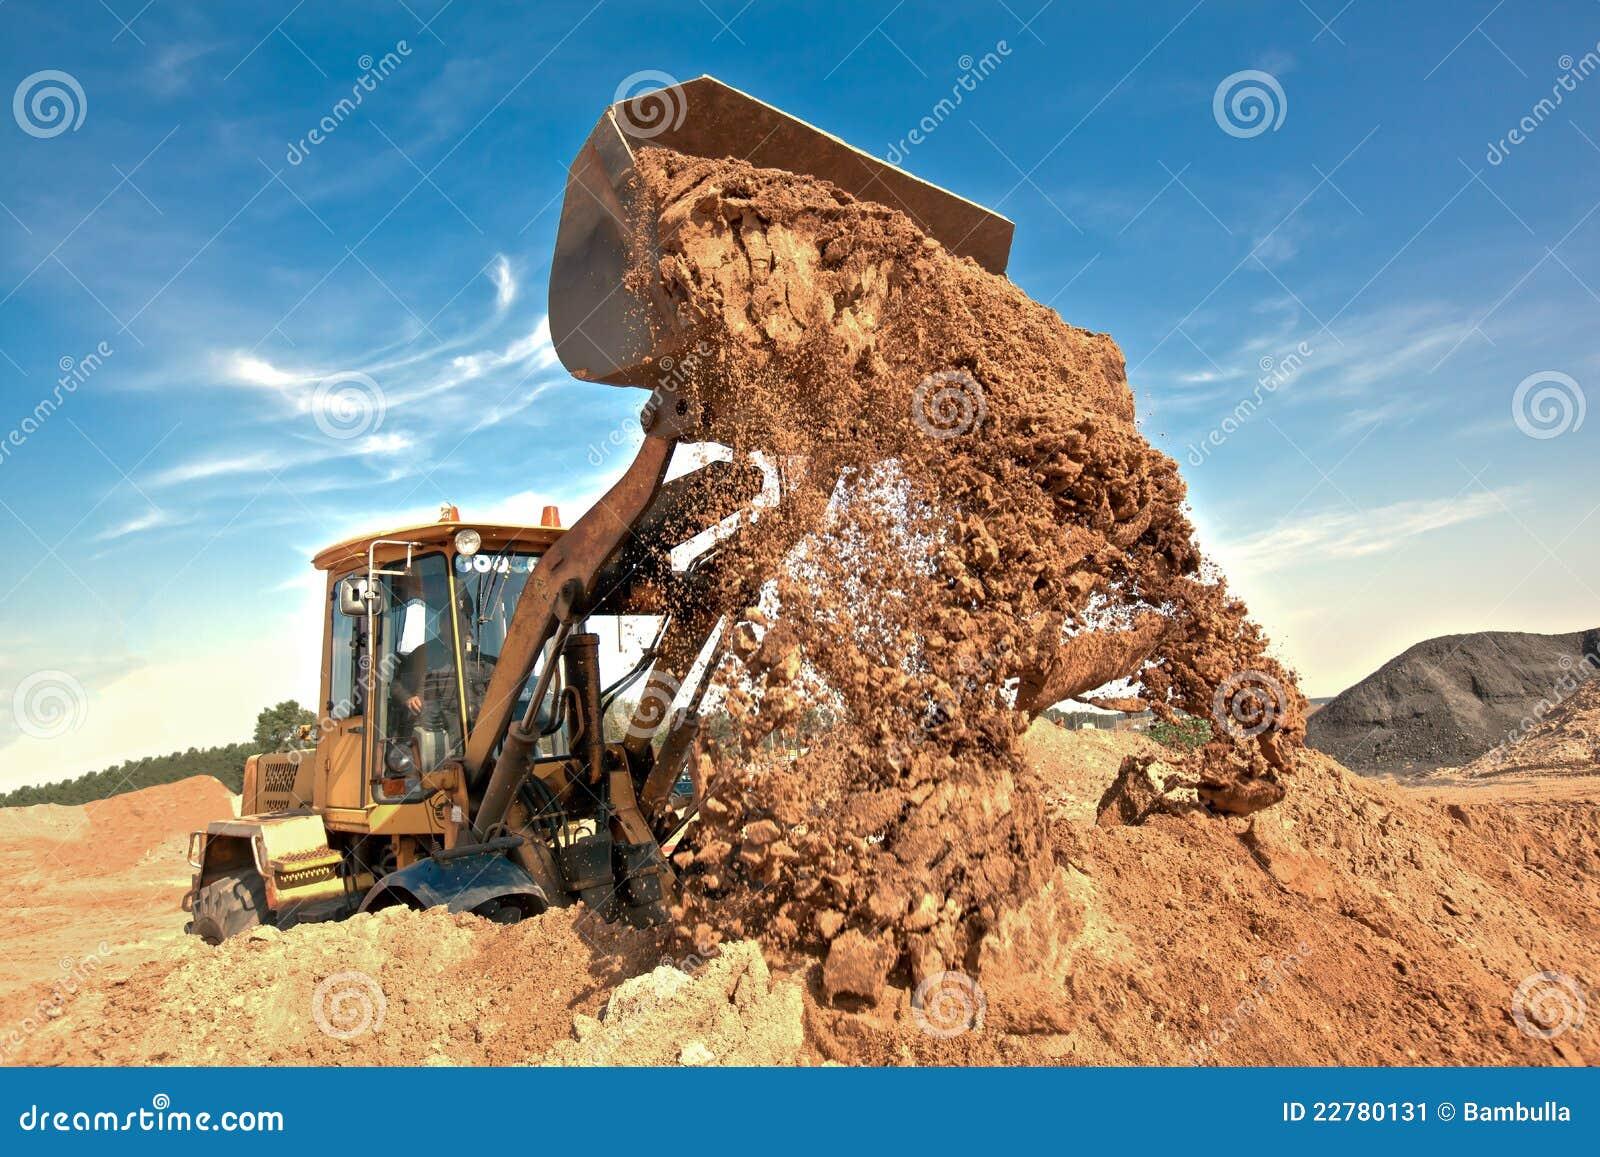 Construction Site Soil : Wheel loader unloading soil at construction site stock